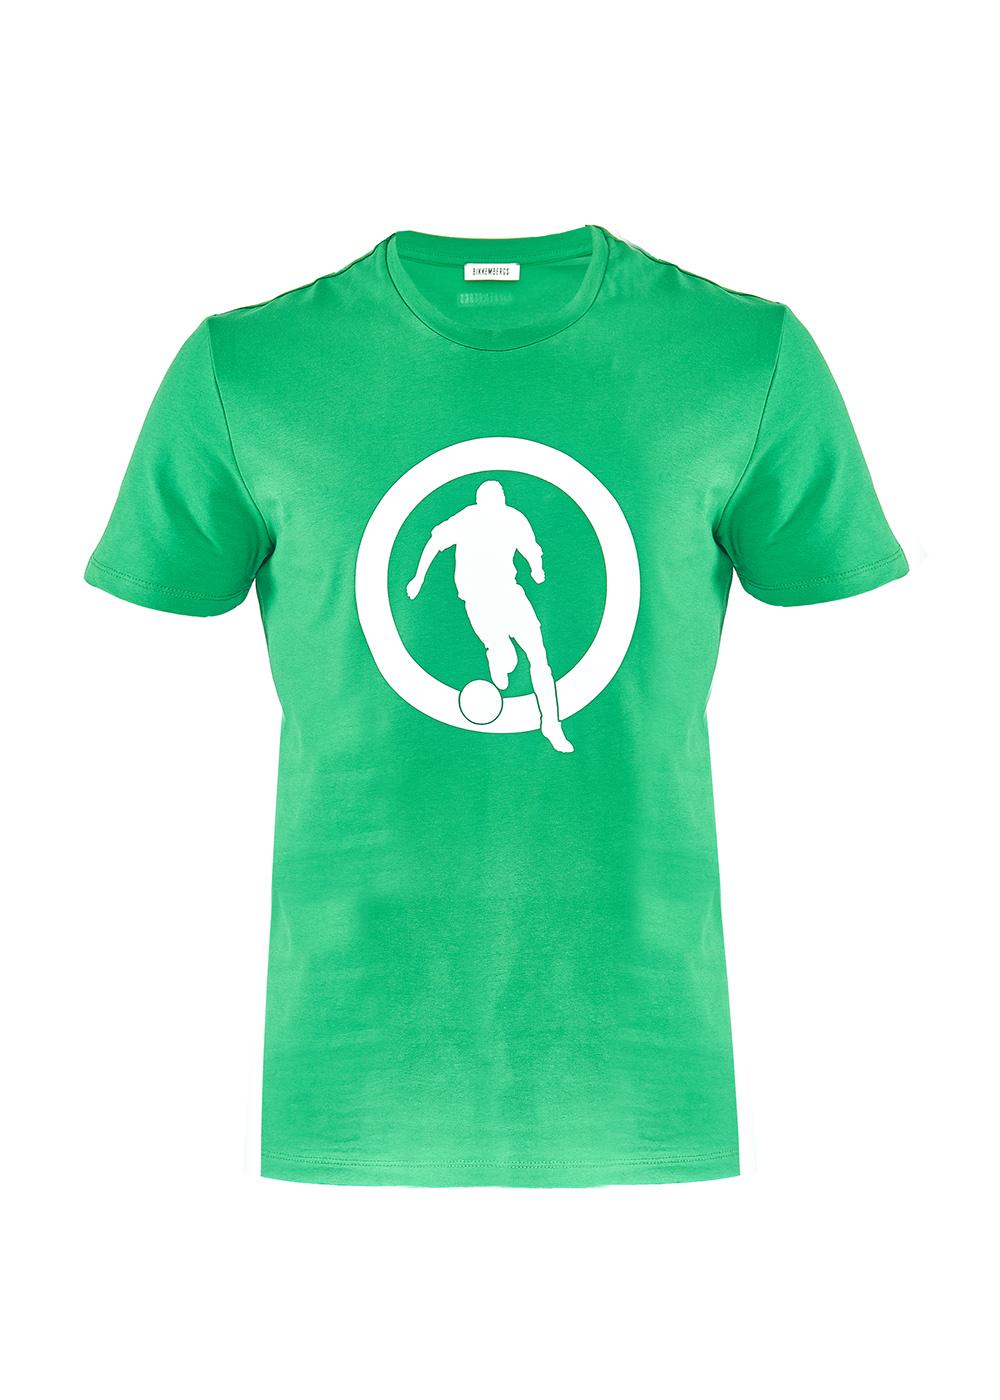 Купить Dirk Bikkembergs футболка